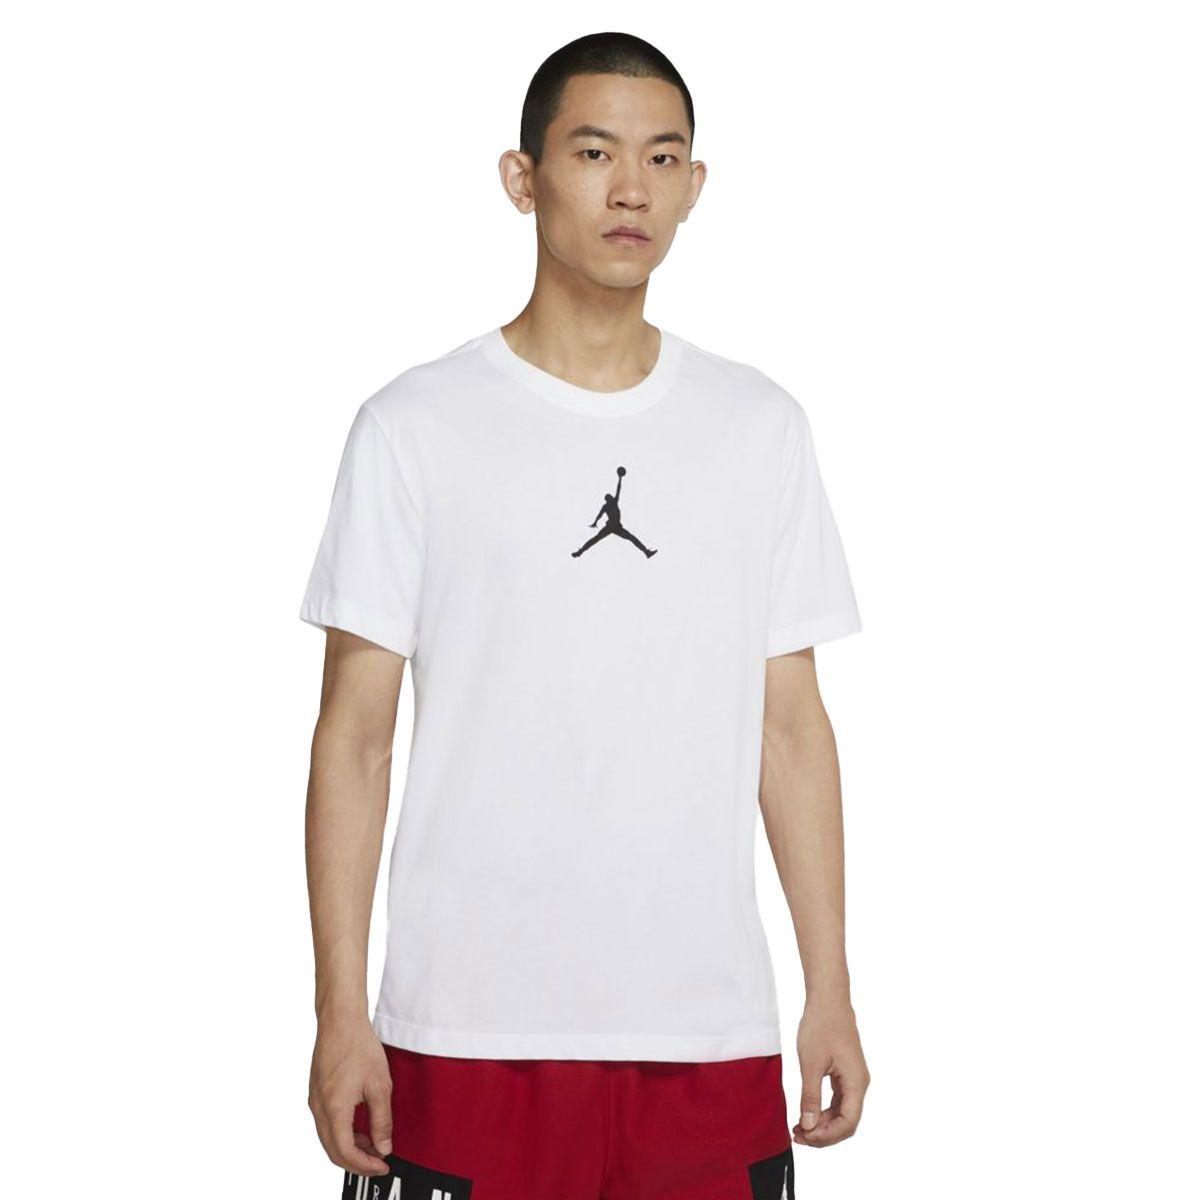 T-Shirt Uomo Nike Jordan Jumpman manica corta White Black